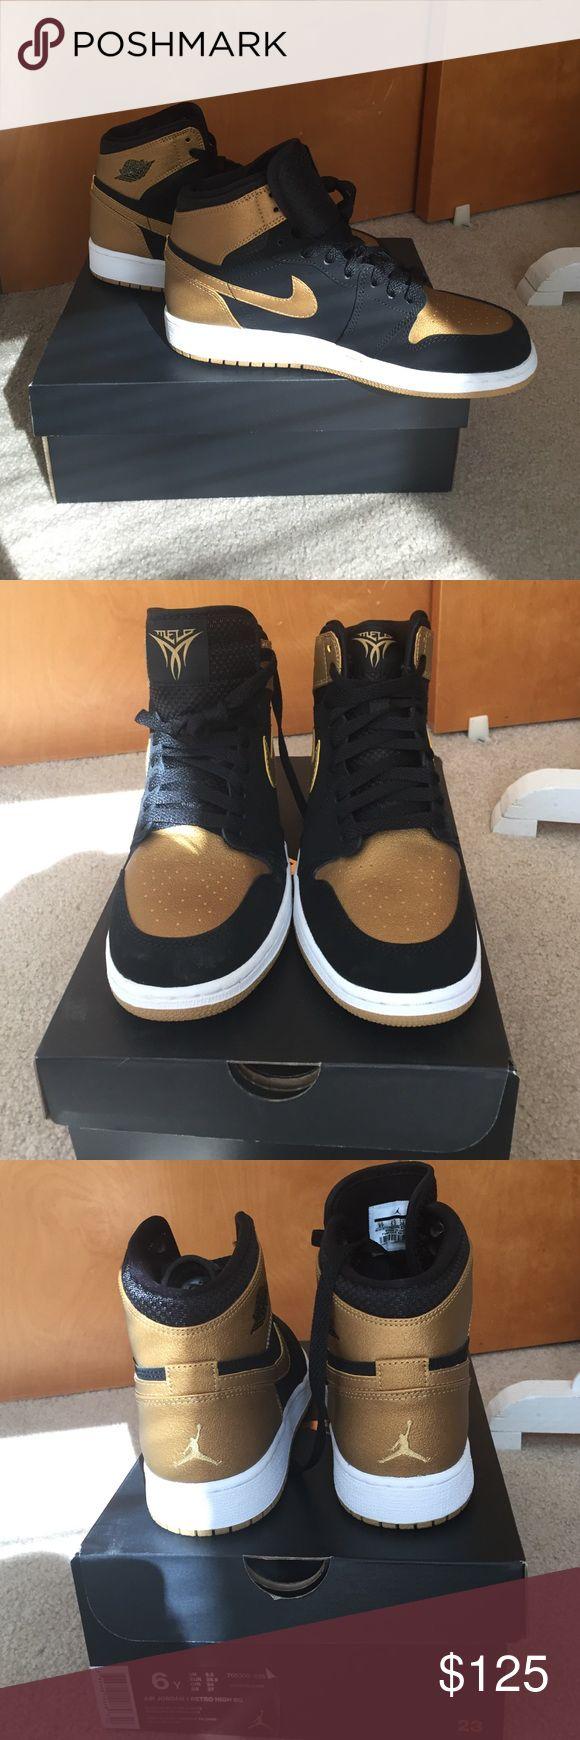 Air Jordan 1 Retro High Melo Nike BNIB BNIB women's size 7 Air Jordan 1 Retro. Black with gold colorway. Never Worn! Sad to see these babies go! Nike Shoes Athletic Shoes